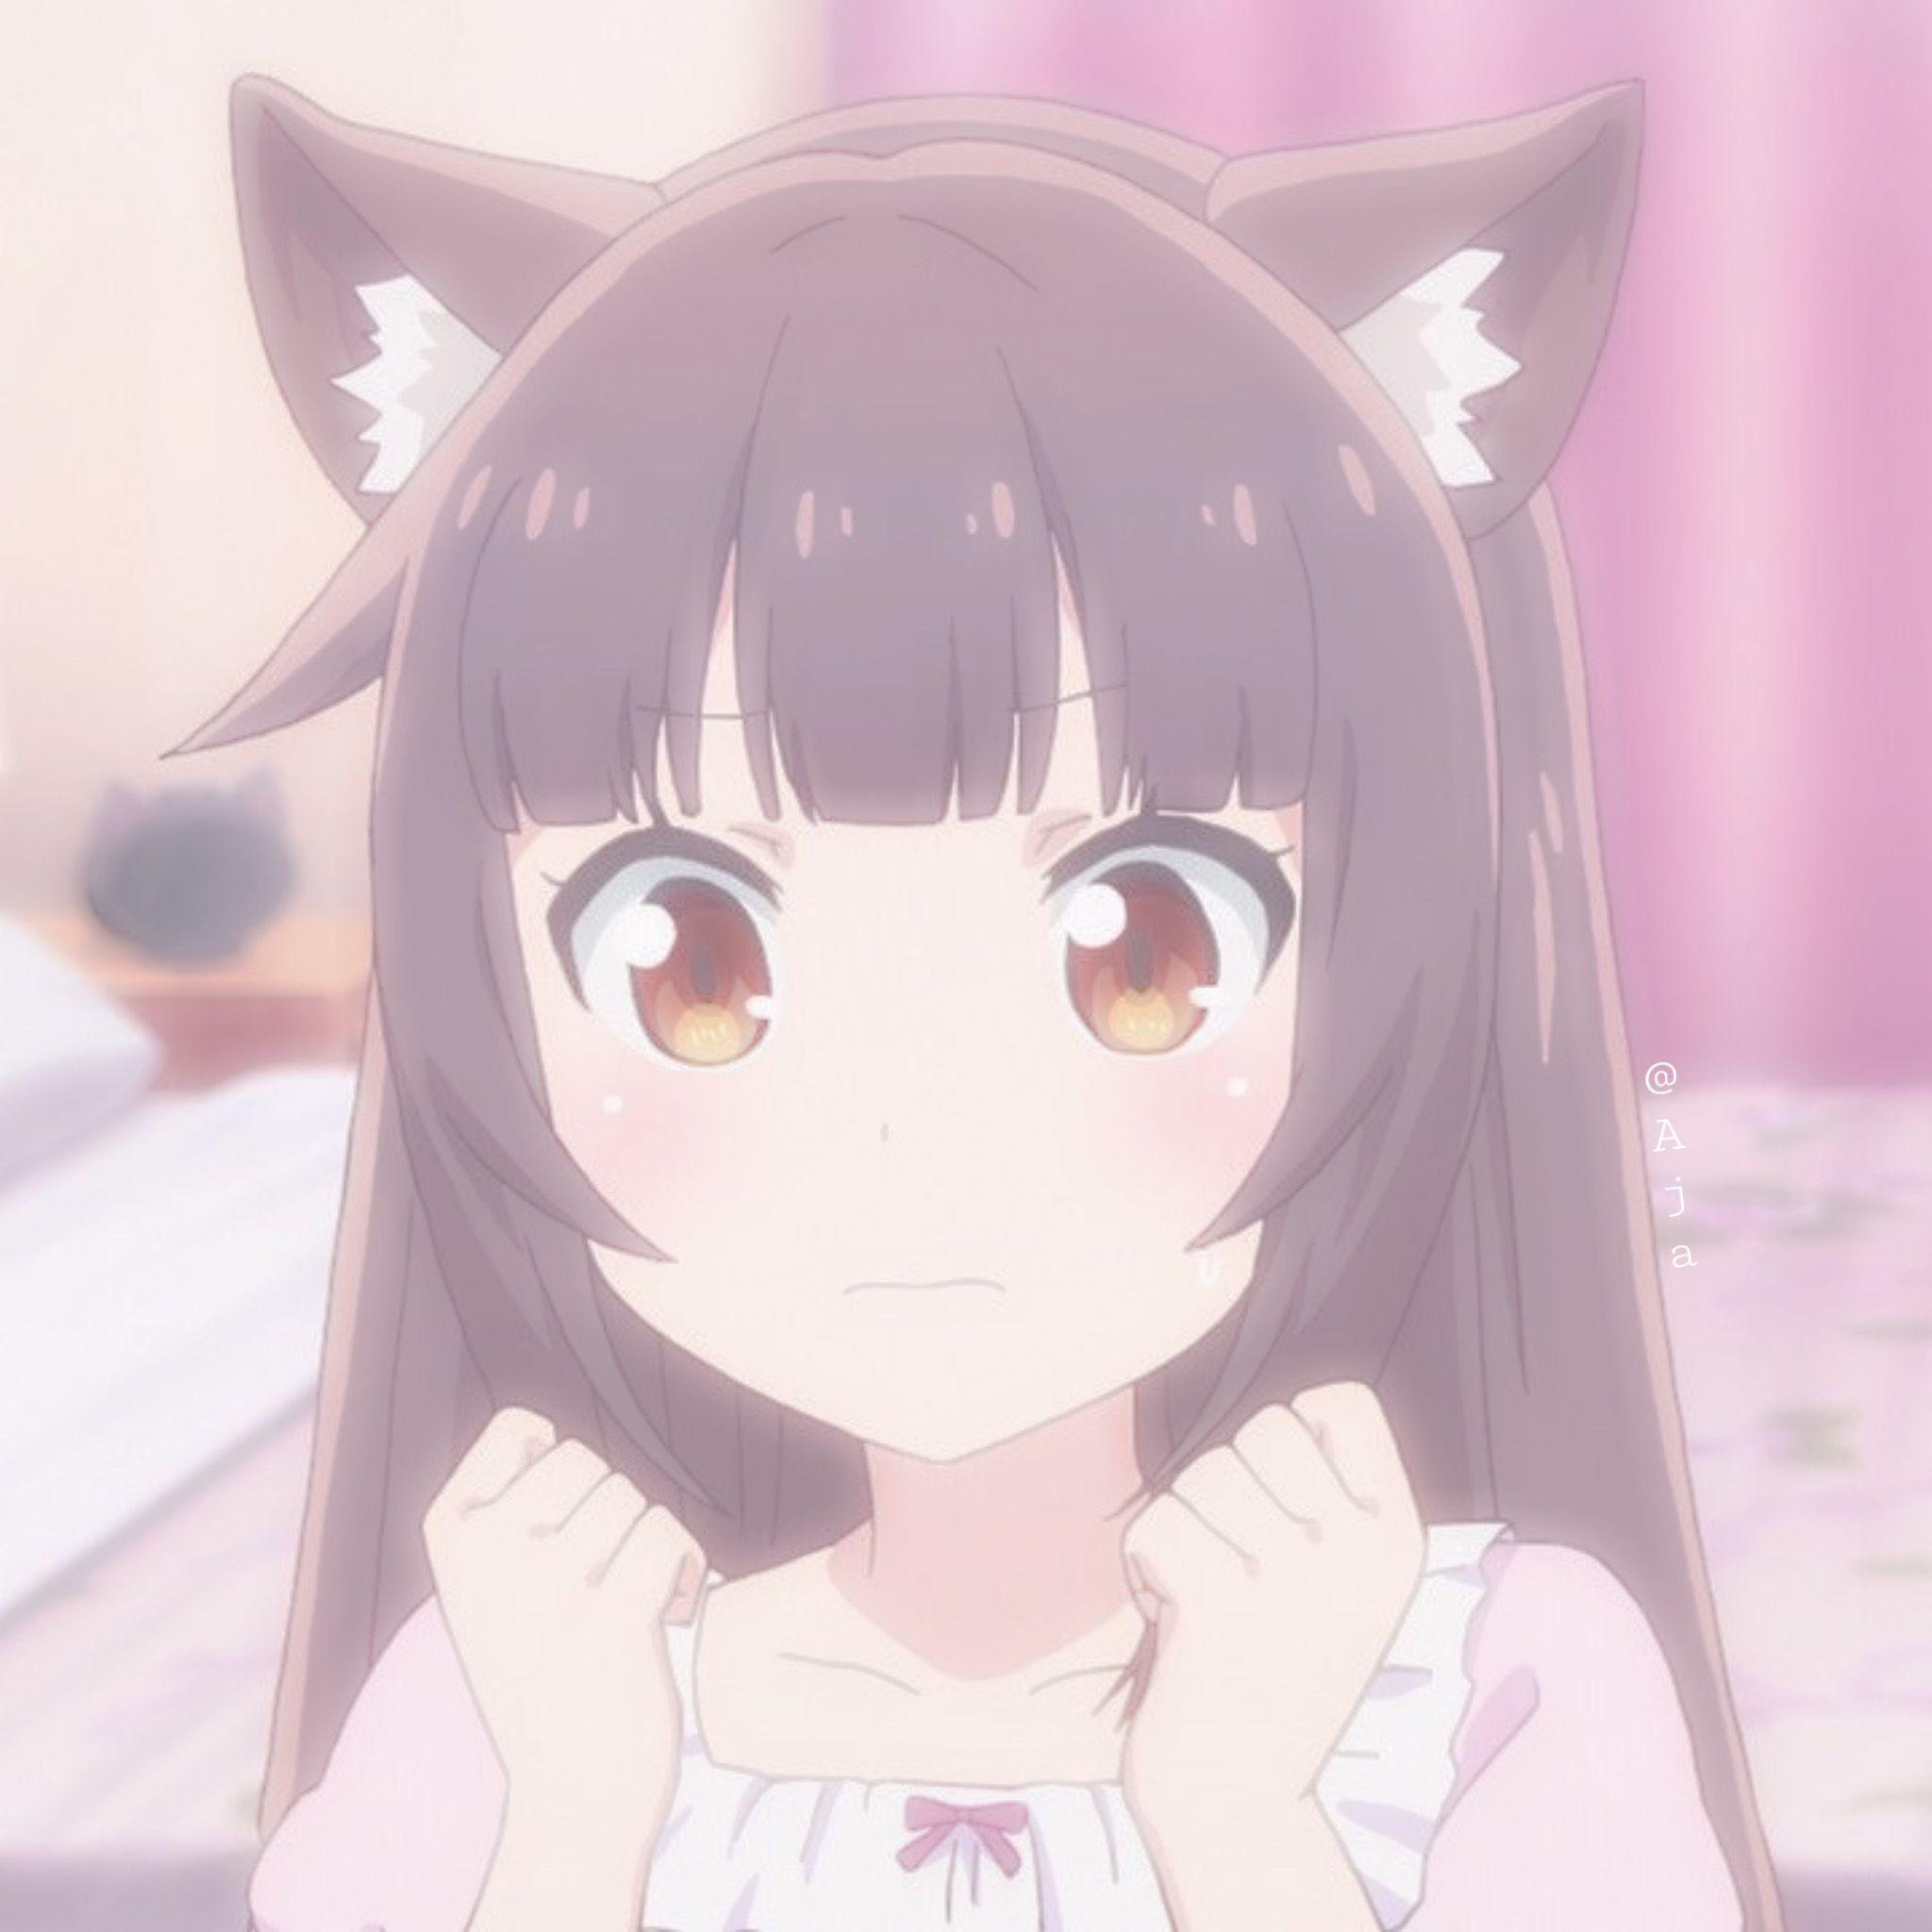 𝒜𝒿𝒶 🎀 *.° in 2020 | Chibi anime kawaii, Aesthetic anime ...